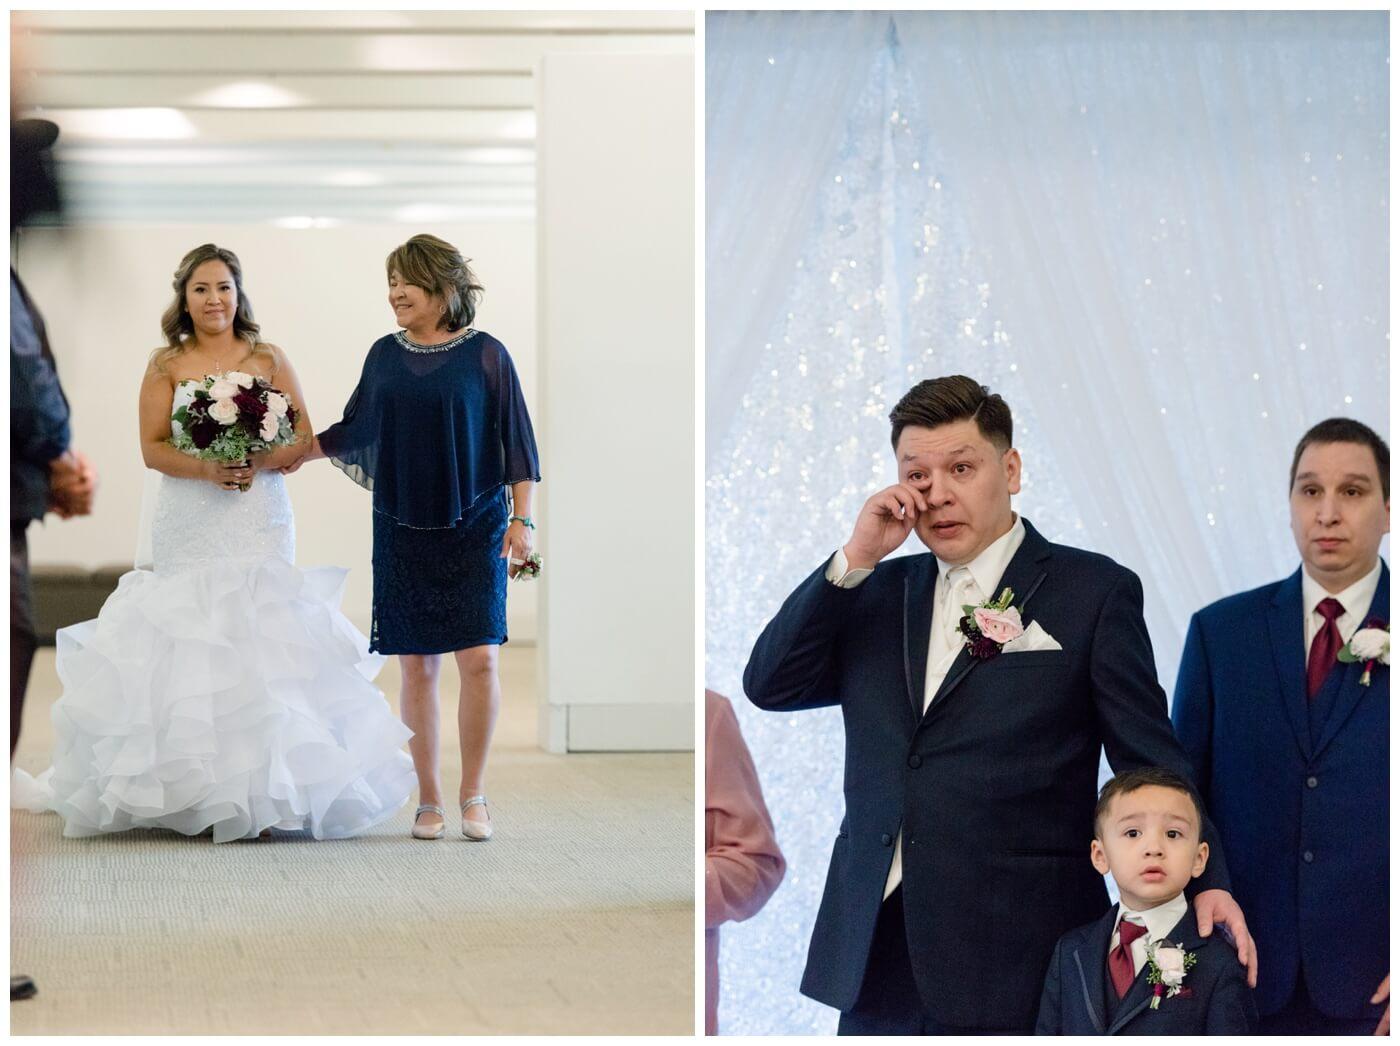 Regina Wedding Photographers - Laurie - Destiny - Fall Wedding - MacKenzie Art Gallery - Traditional First Look